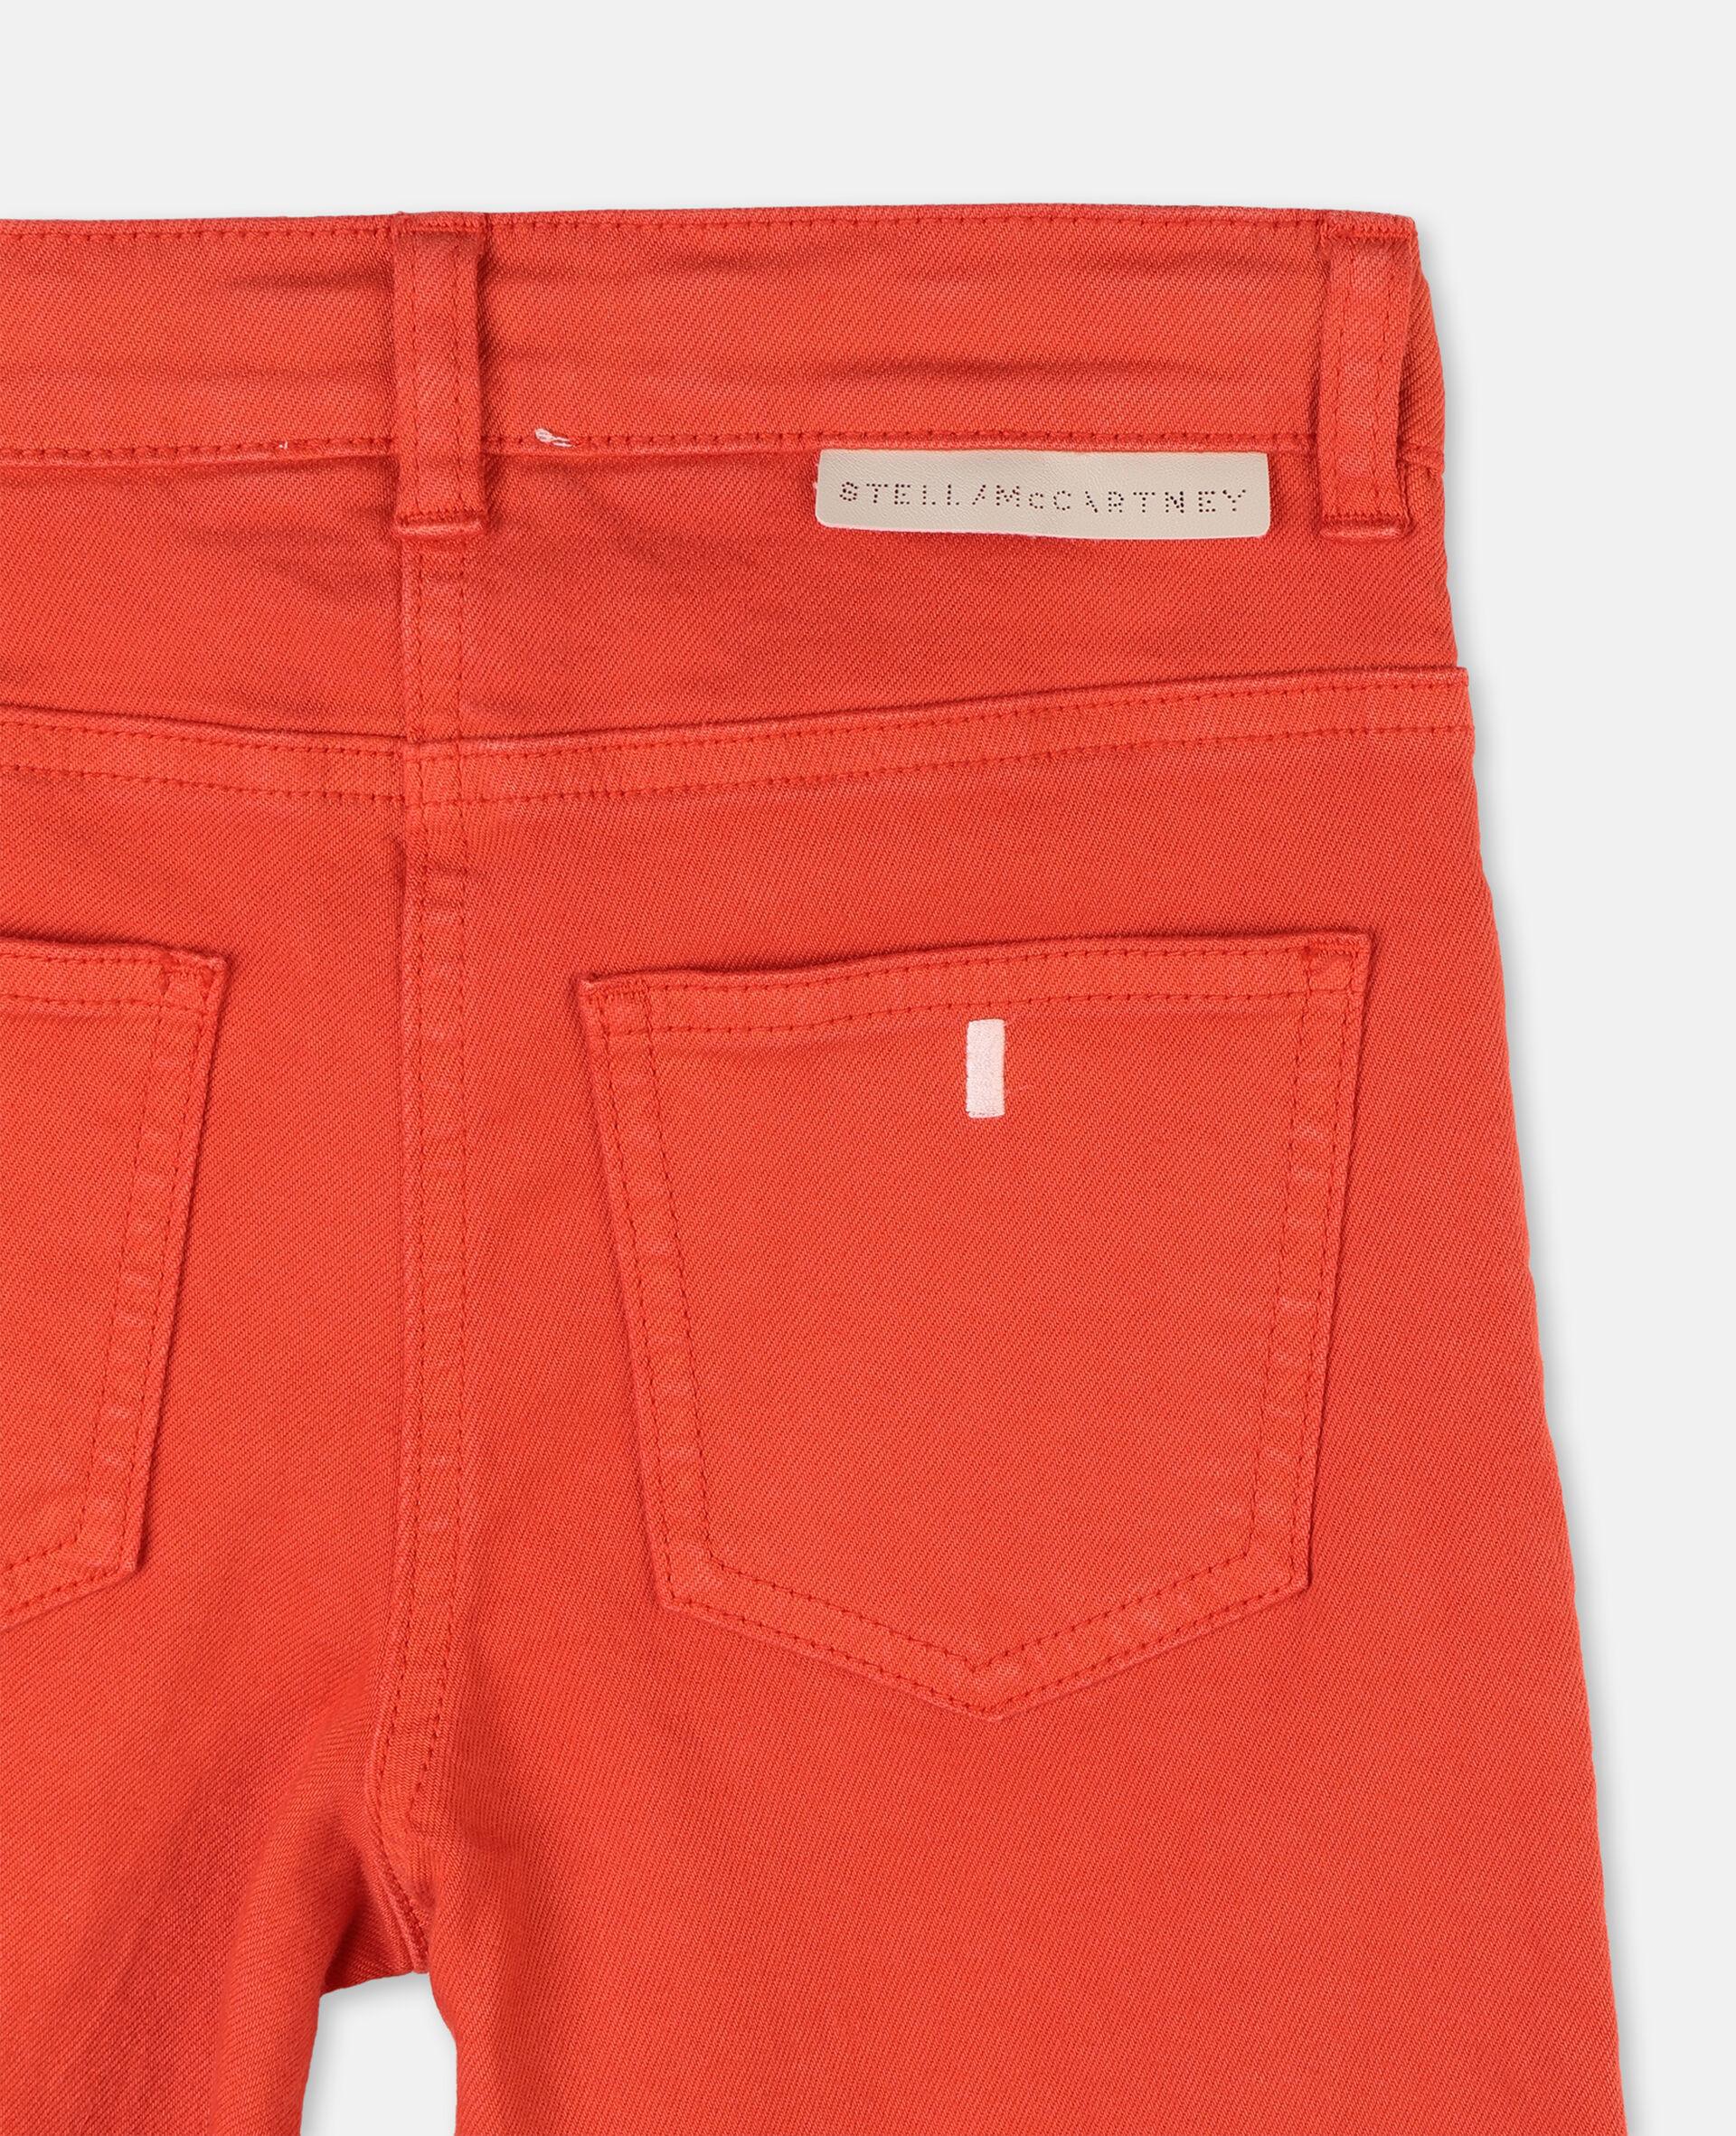 Cotton Denim Pants-Red-large image number 1